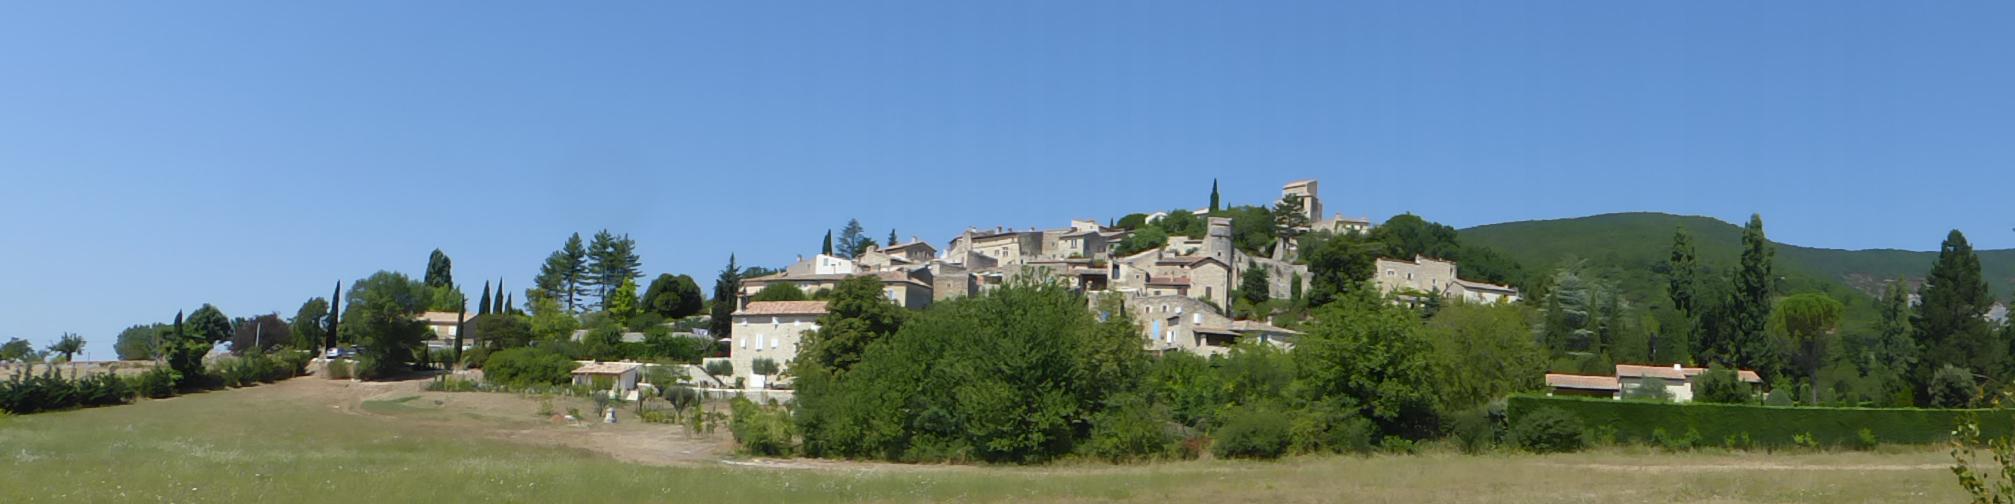 Drôme-Amiradou